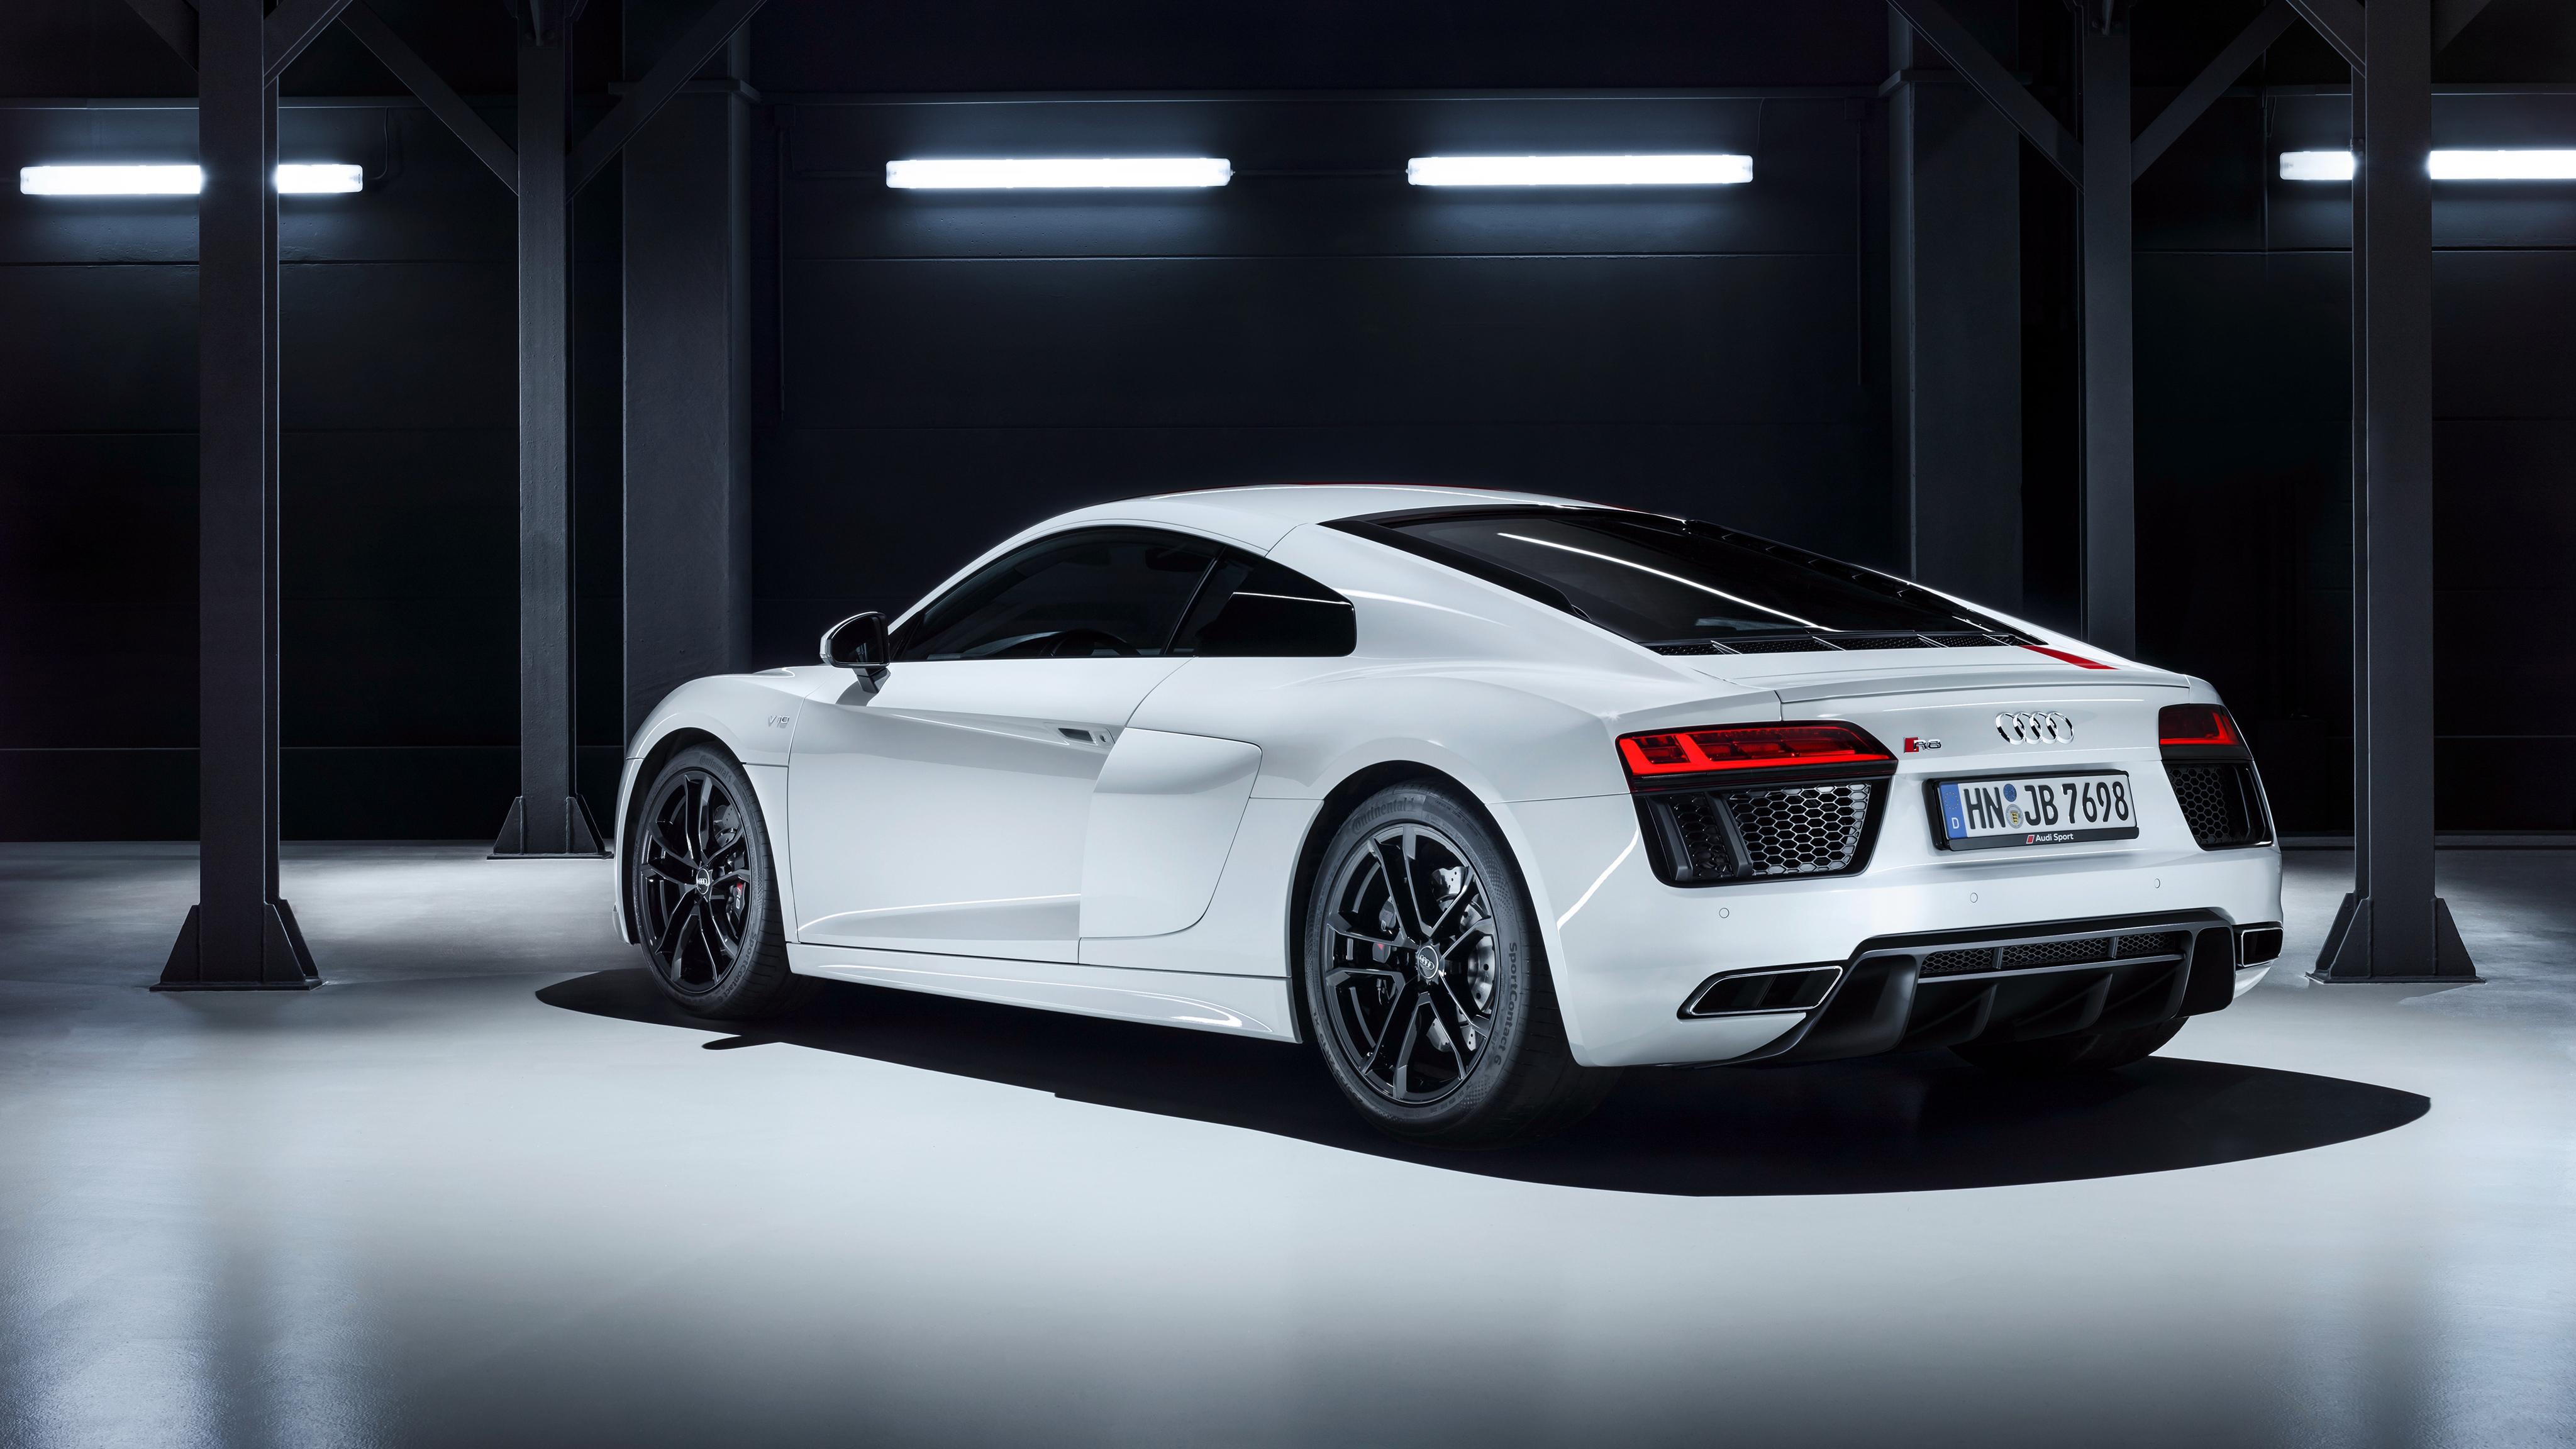 2017 Audi R8 Iphone Wallpaper 2018 Audi R8 V10 Rws 4k 4 Wallpaper Hd Car Wallpapers